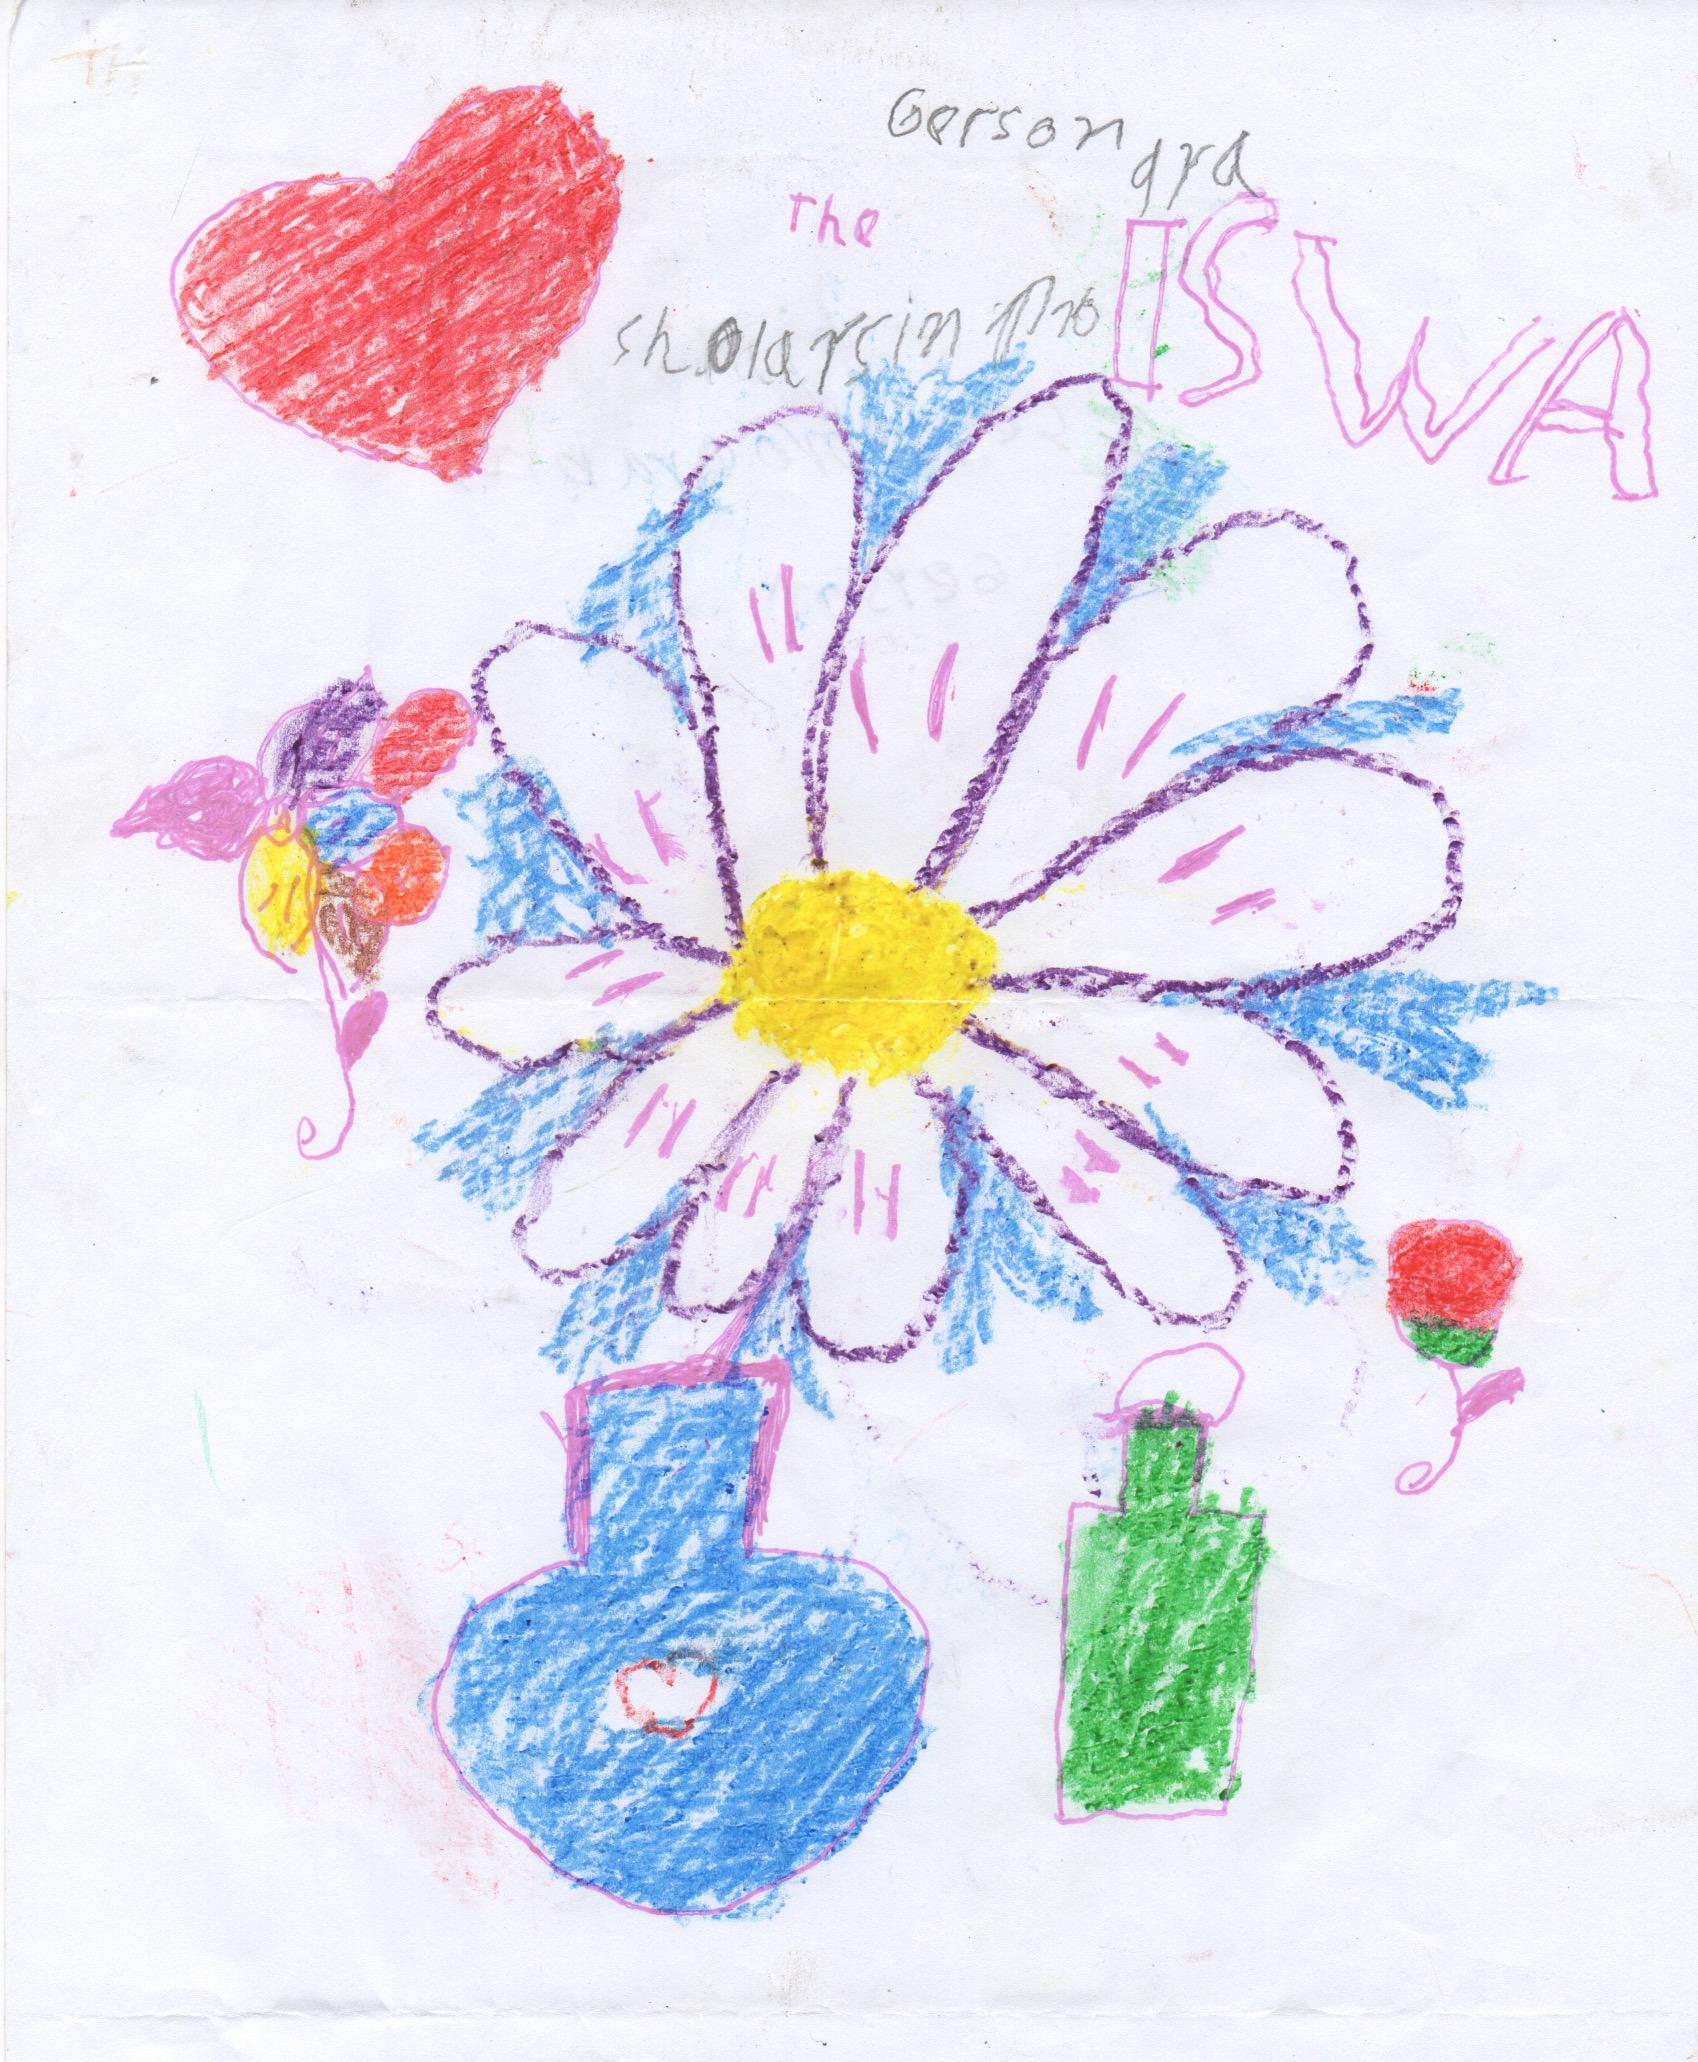 Gerson's winning artwork!